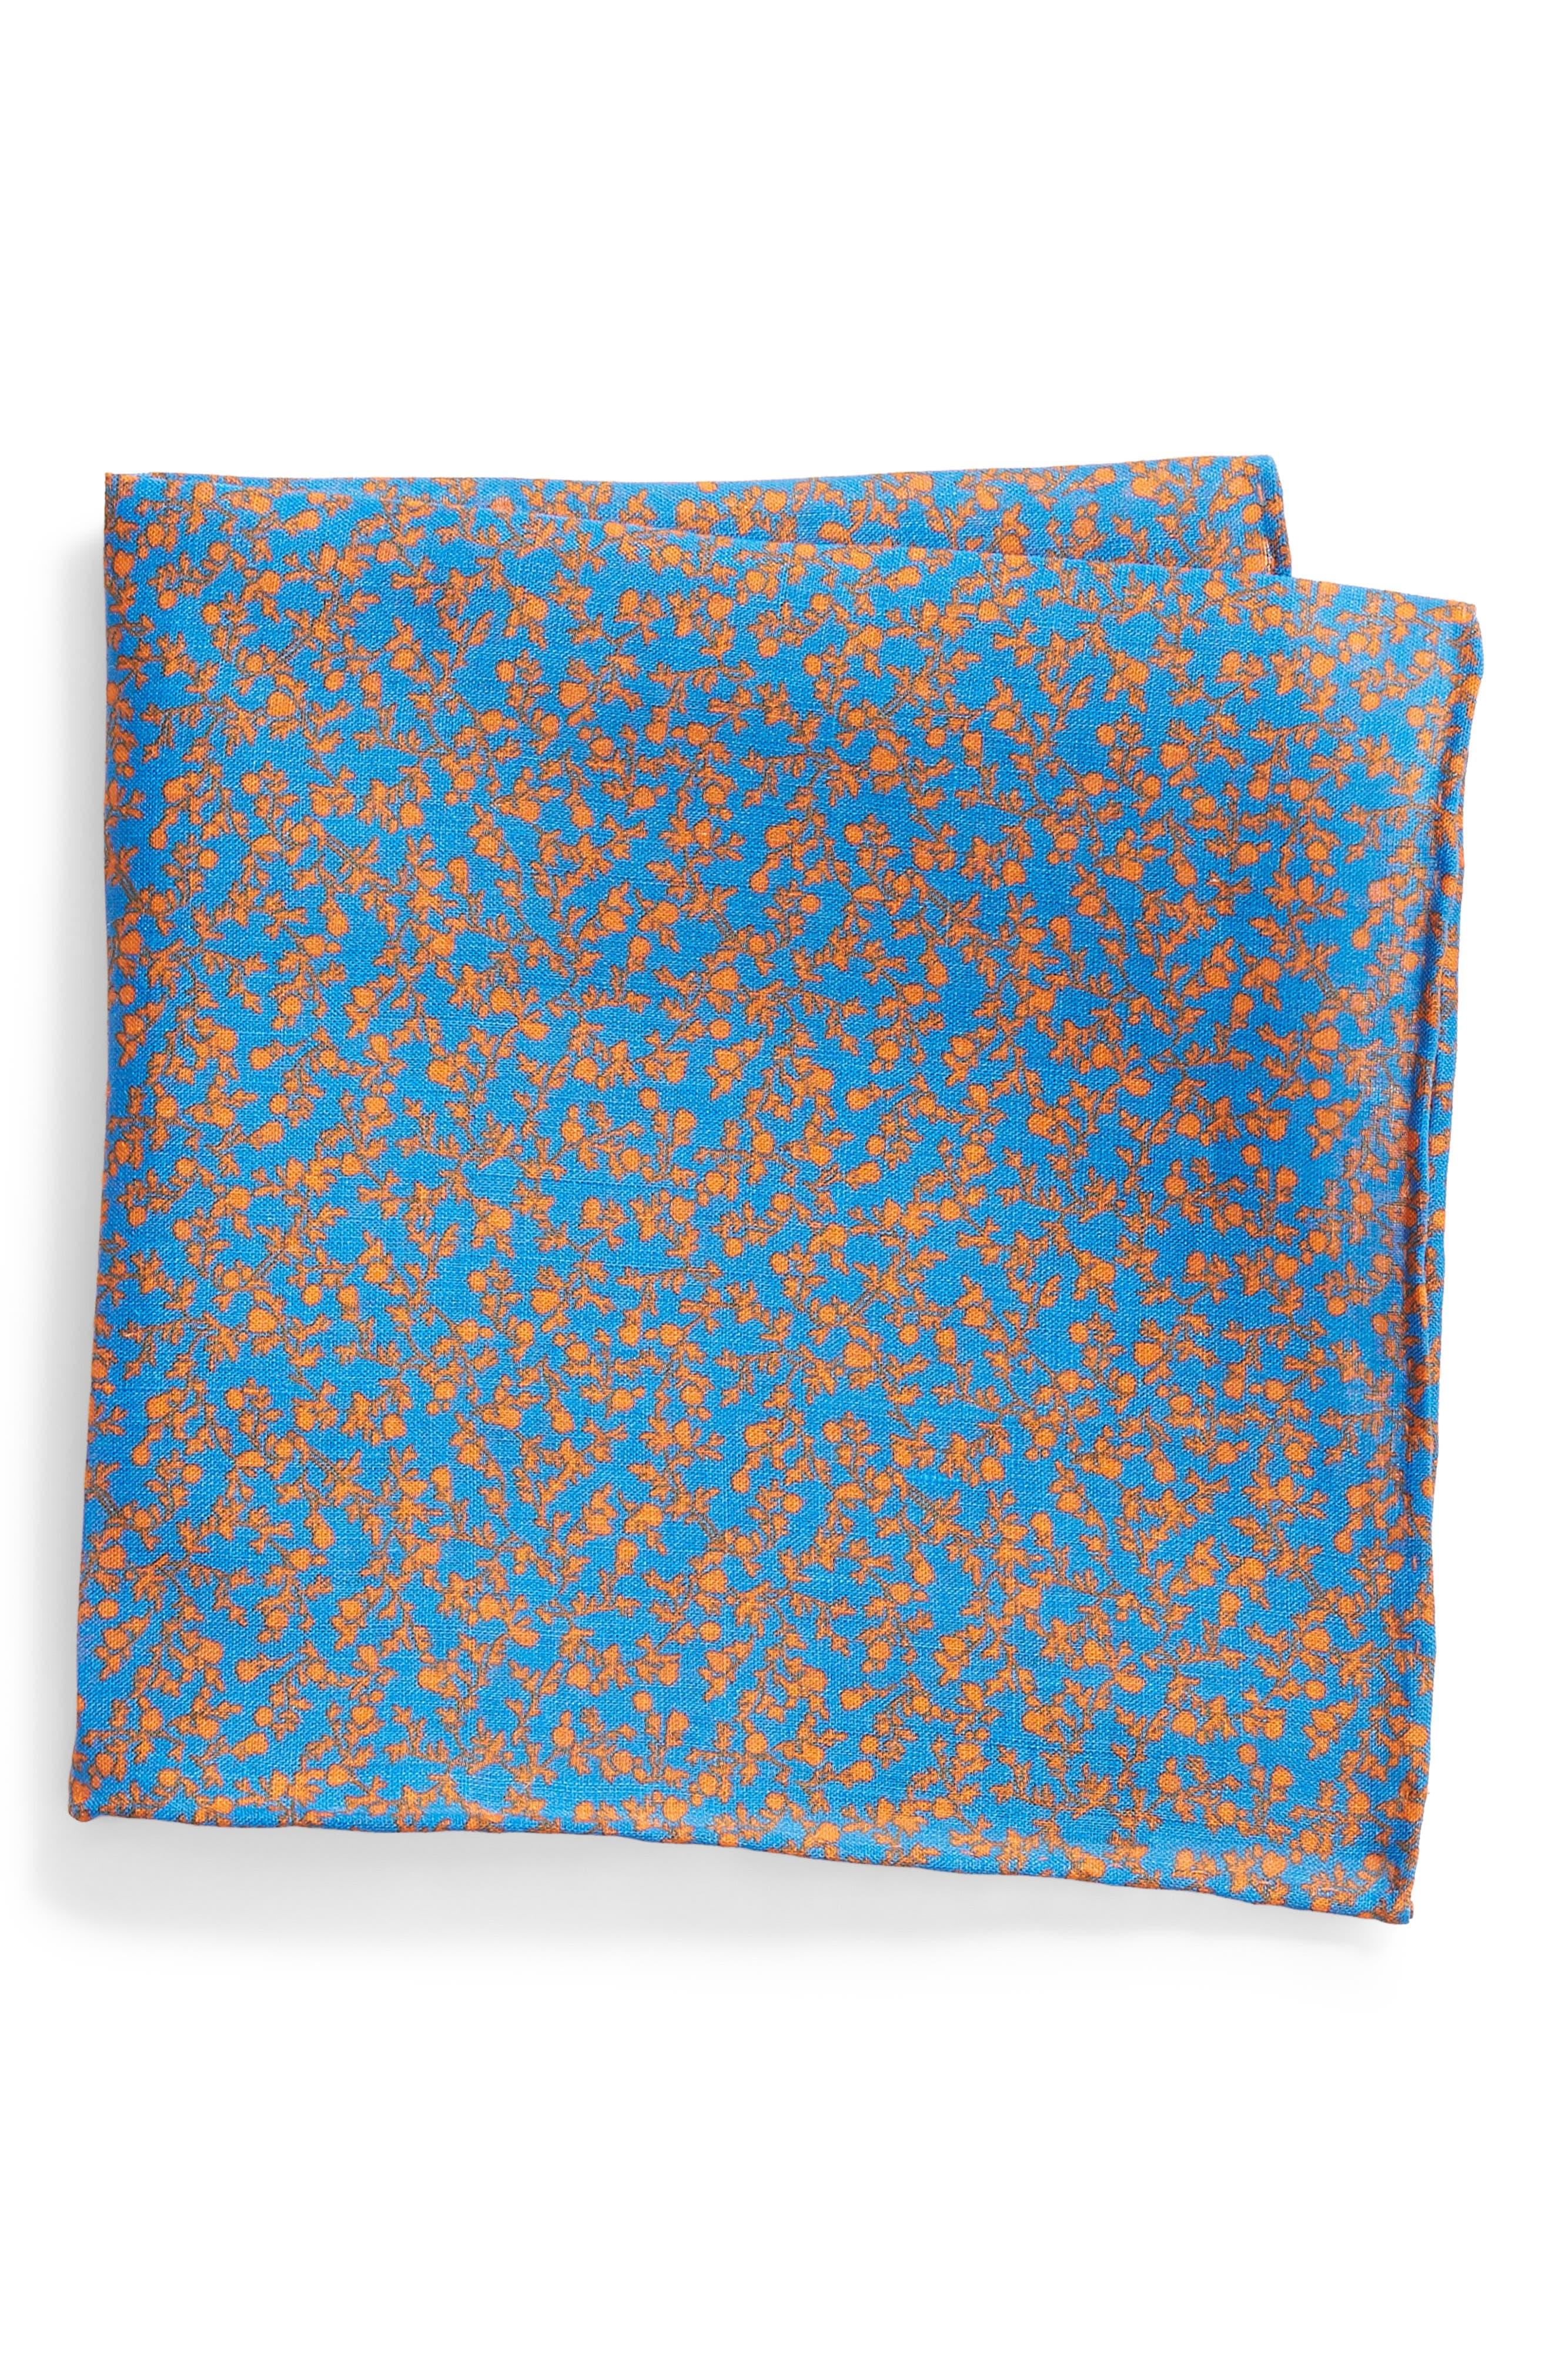 Pocket square orange/purple patterned Etro iPpLnWNd